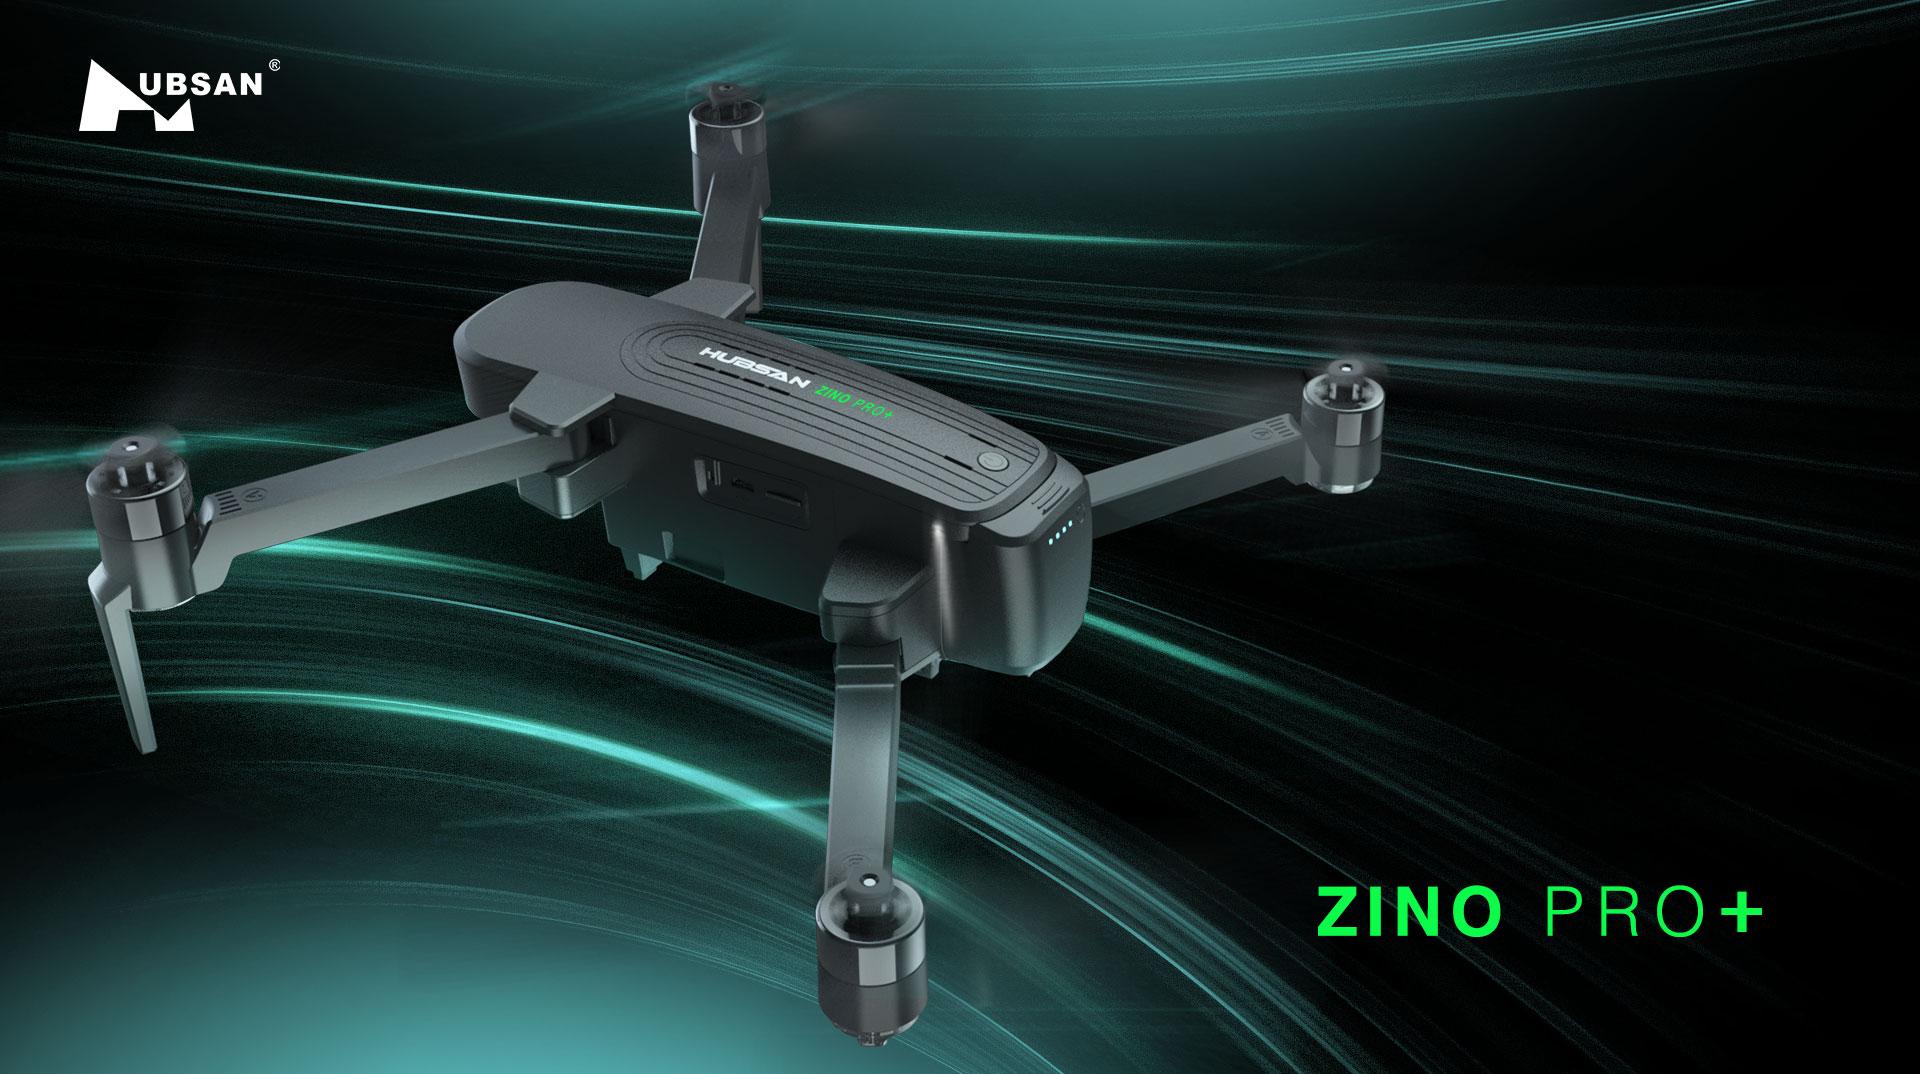 Flycam Hubsan Zino Pro Plus